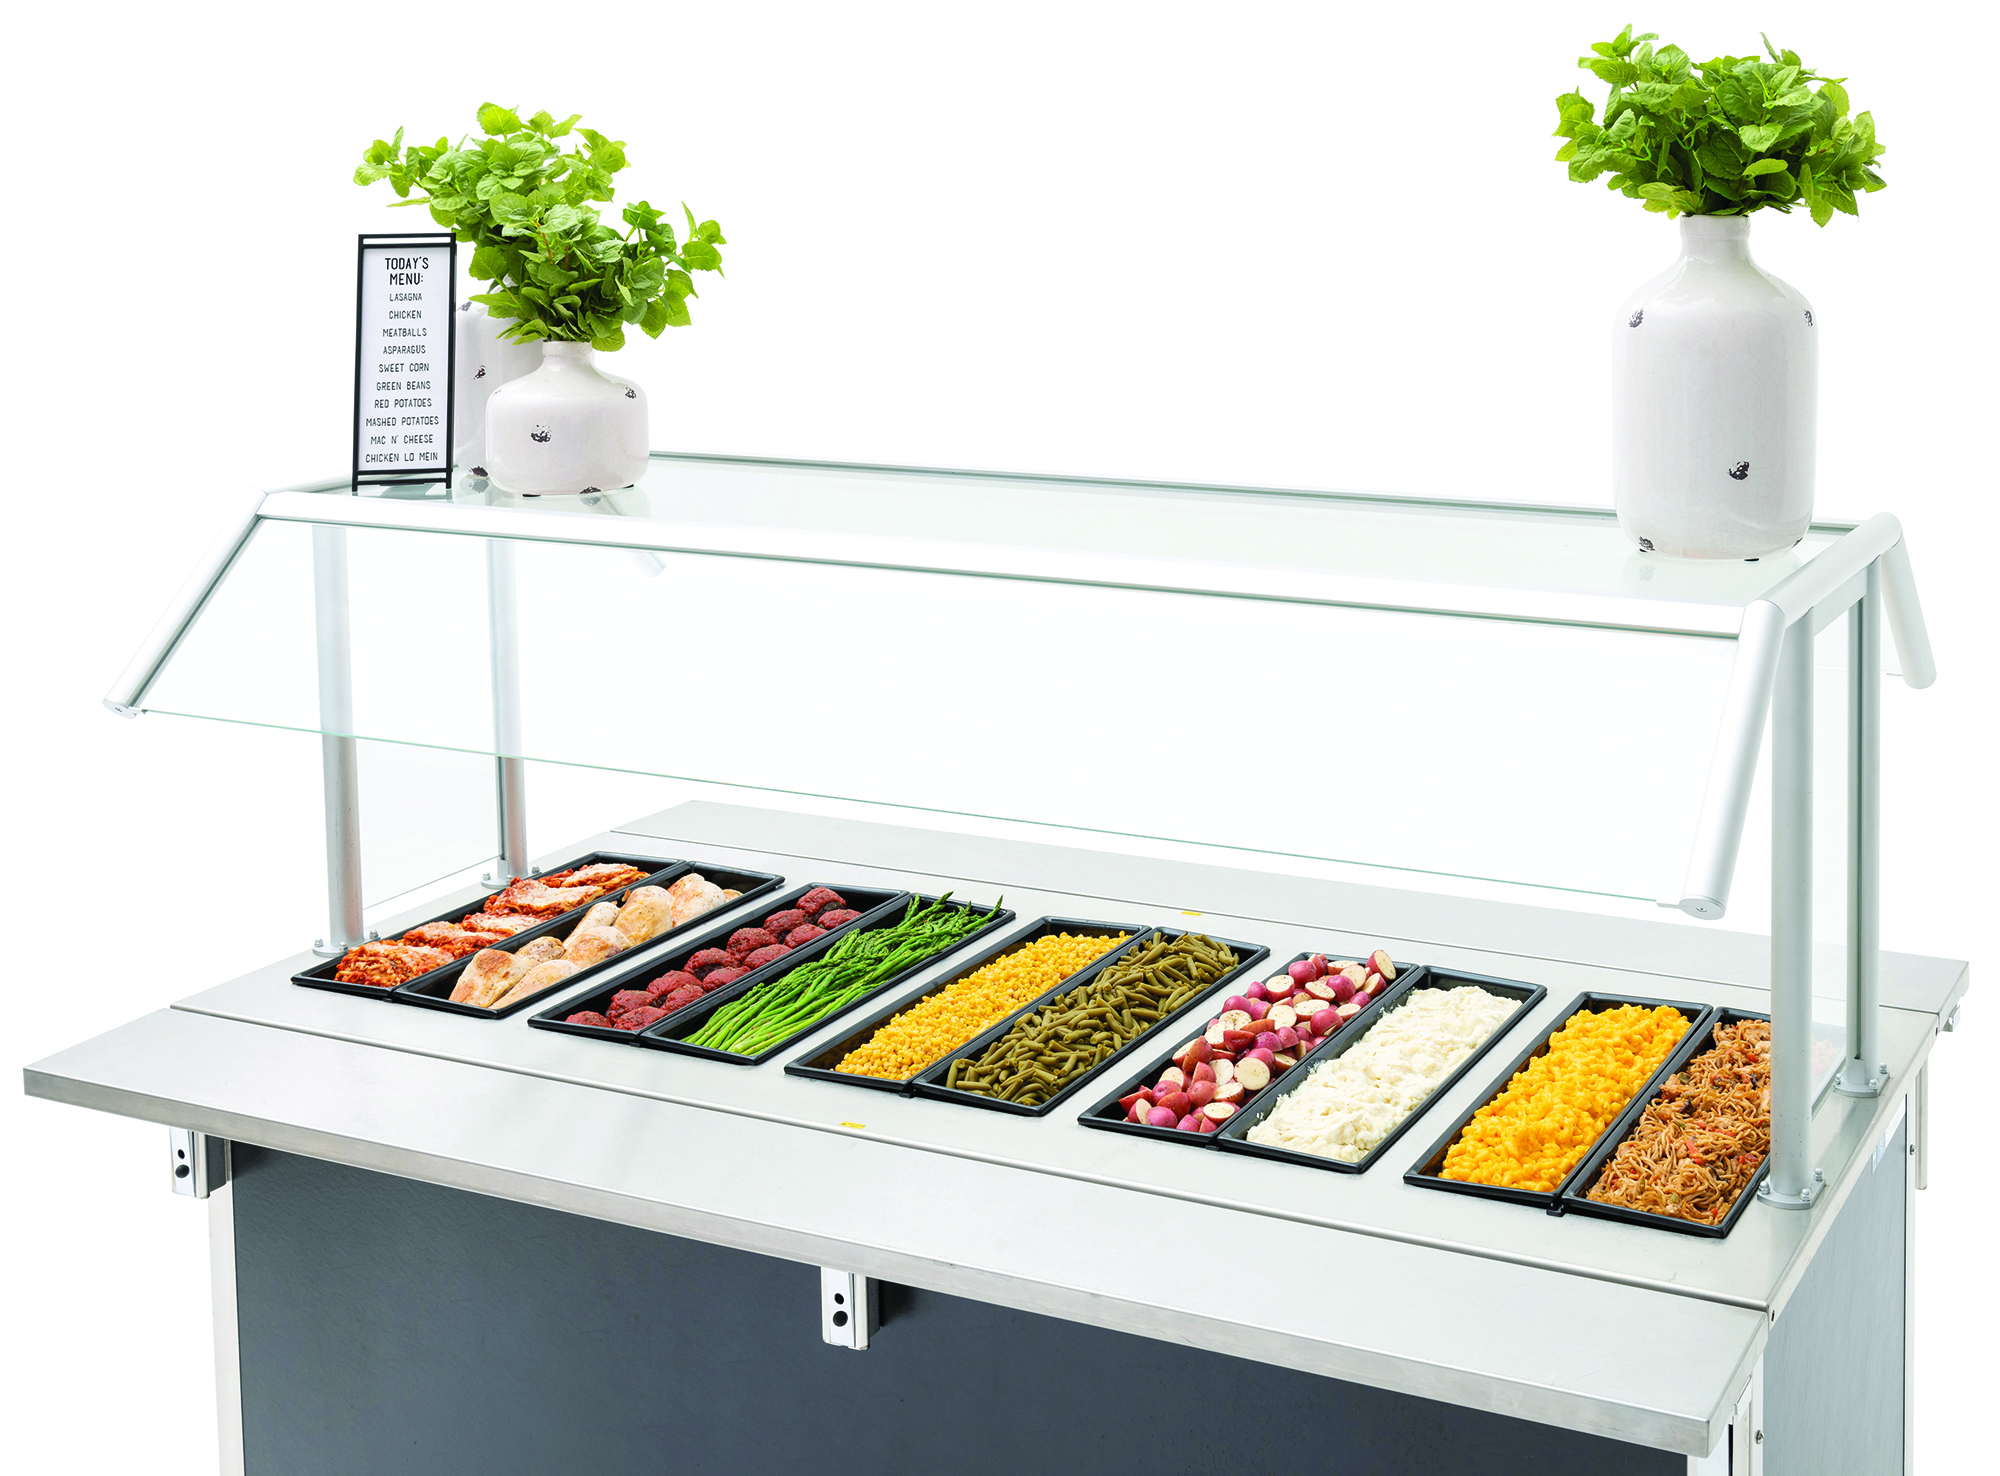 Black SmartFit pans with prepared food in cold bar set up